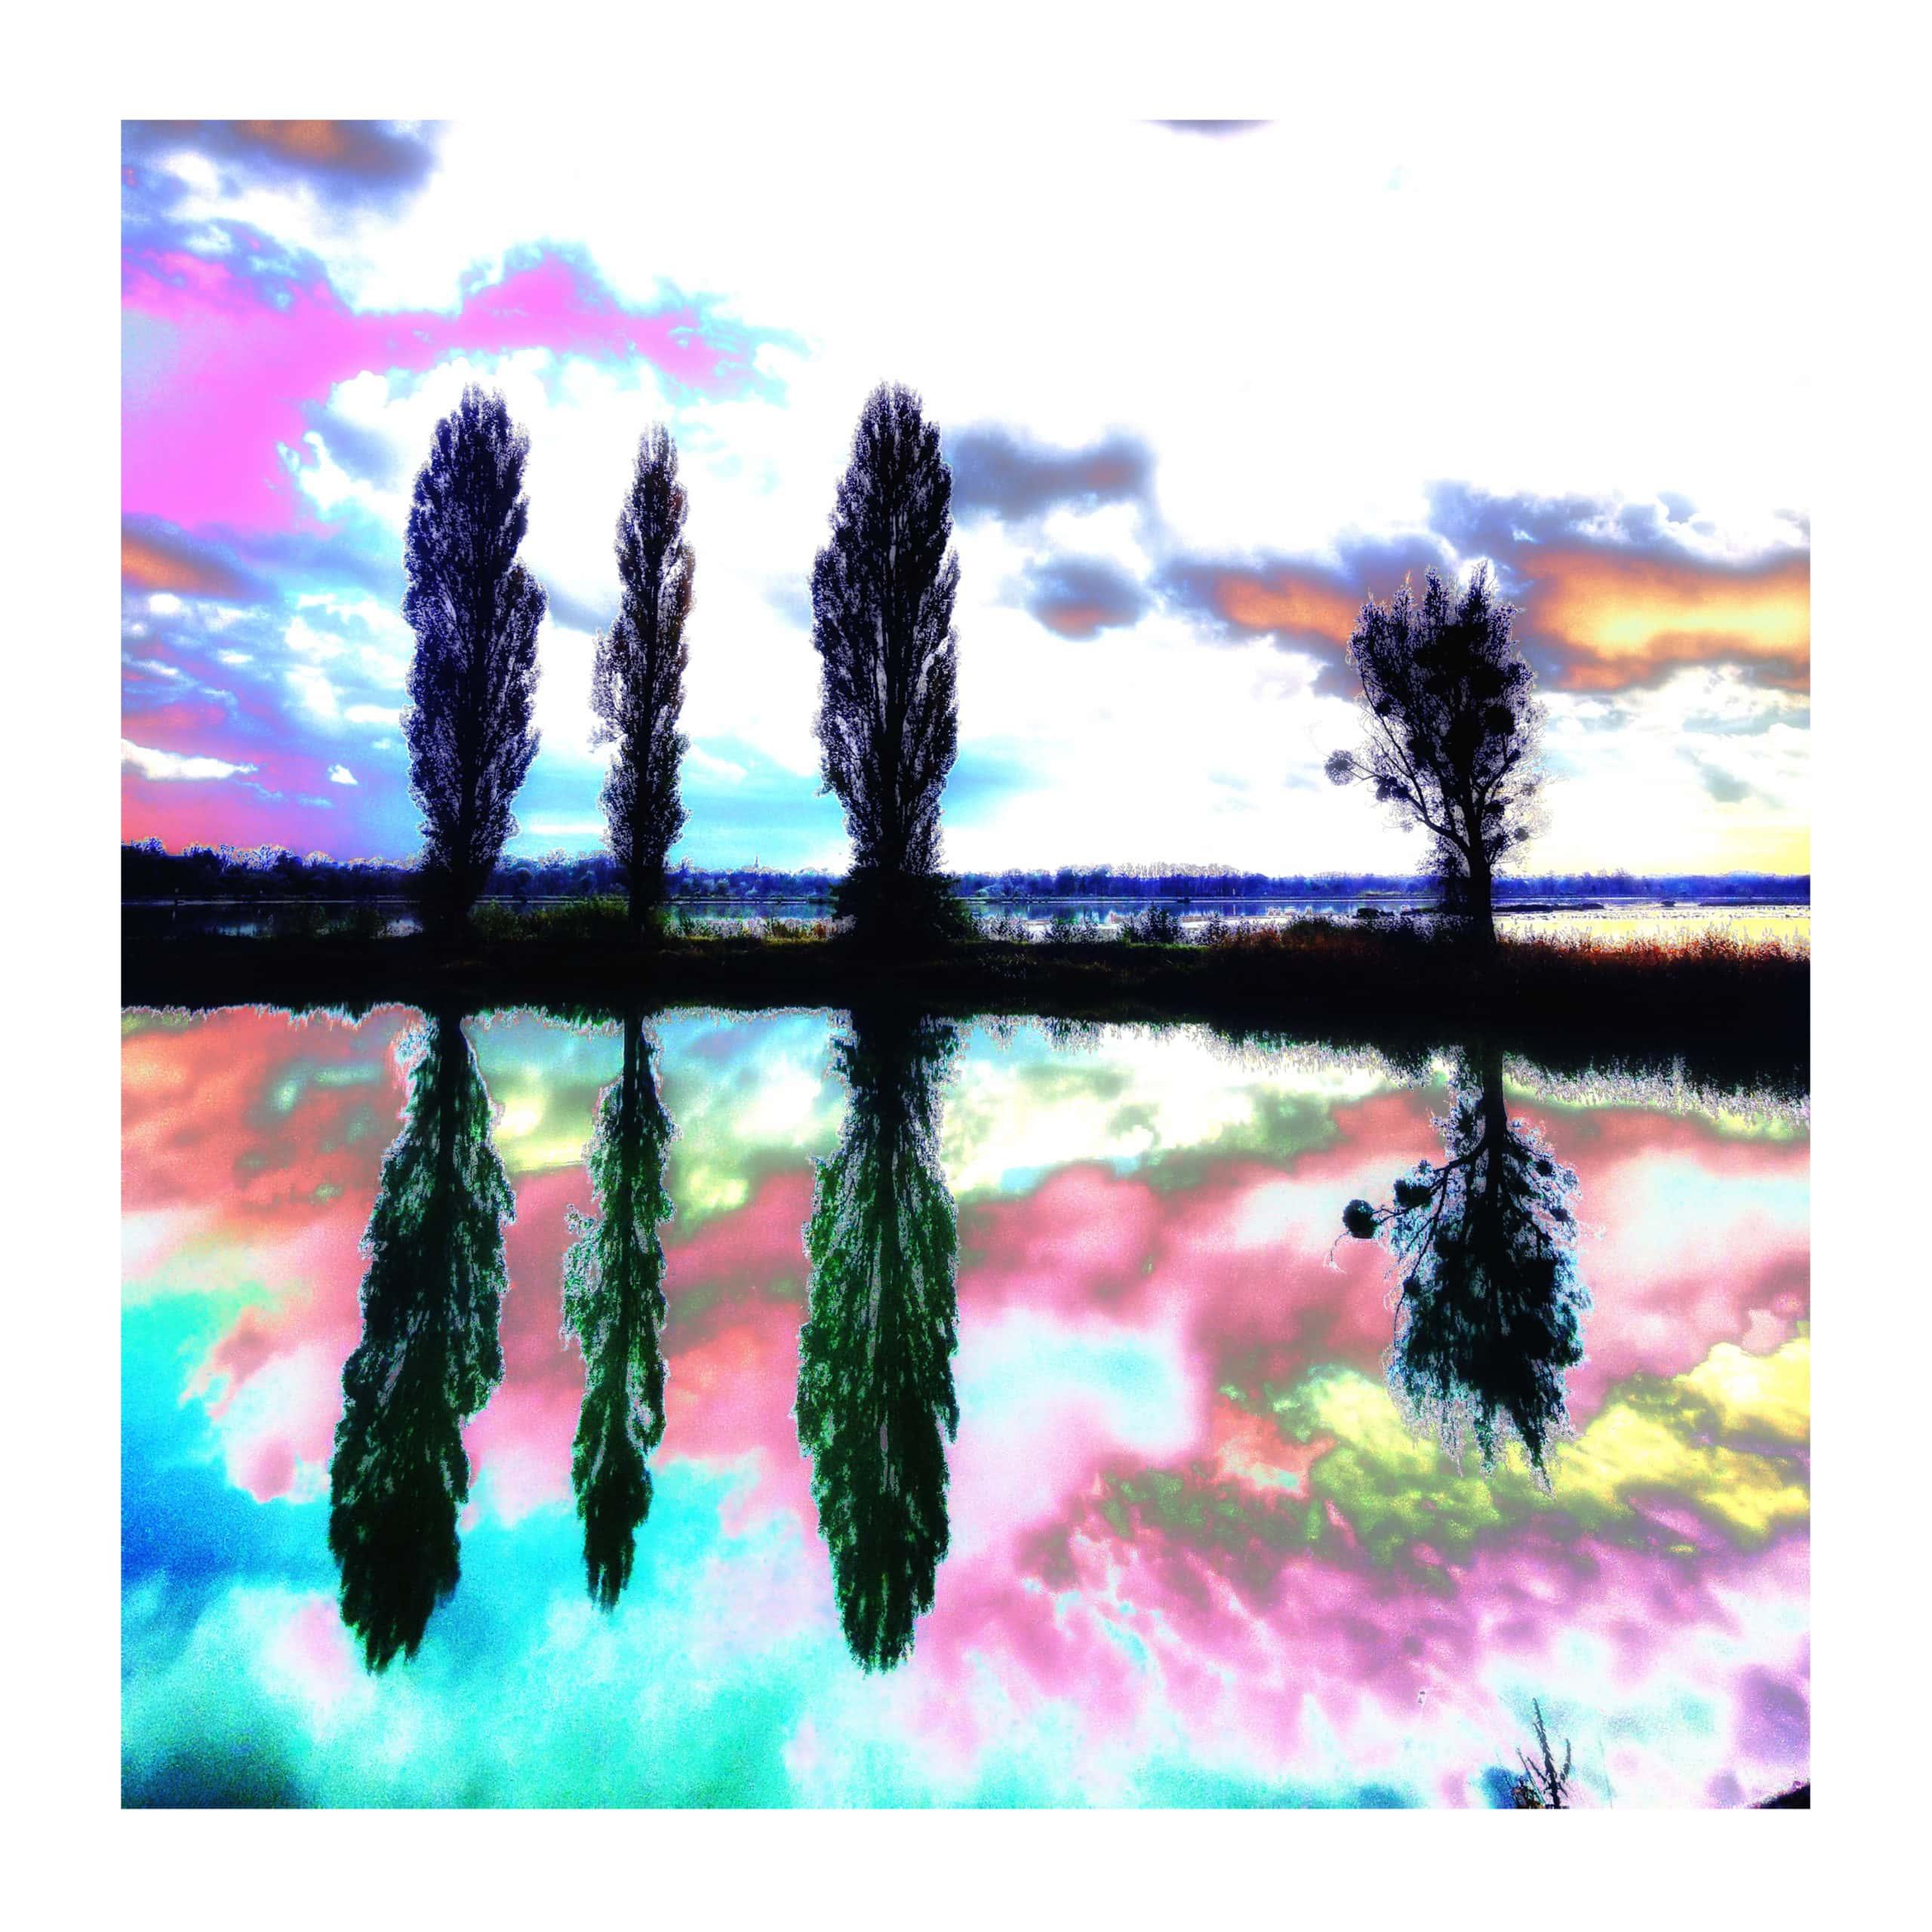 Quadratisches Format V- Leopoldi-Art